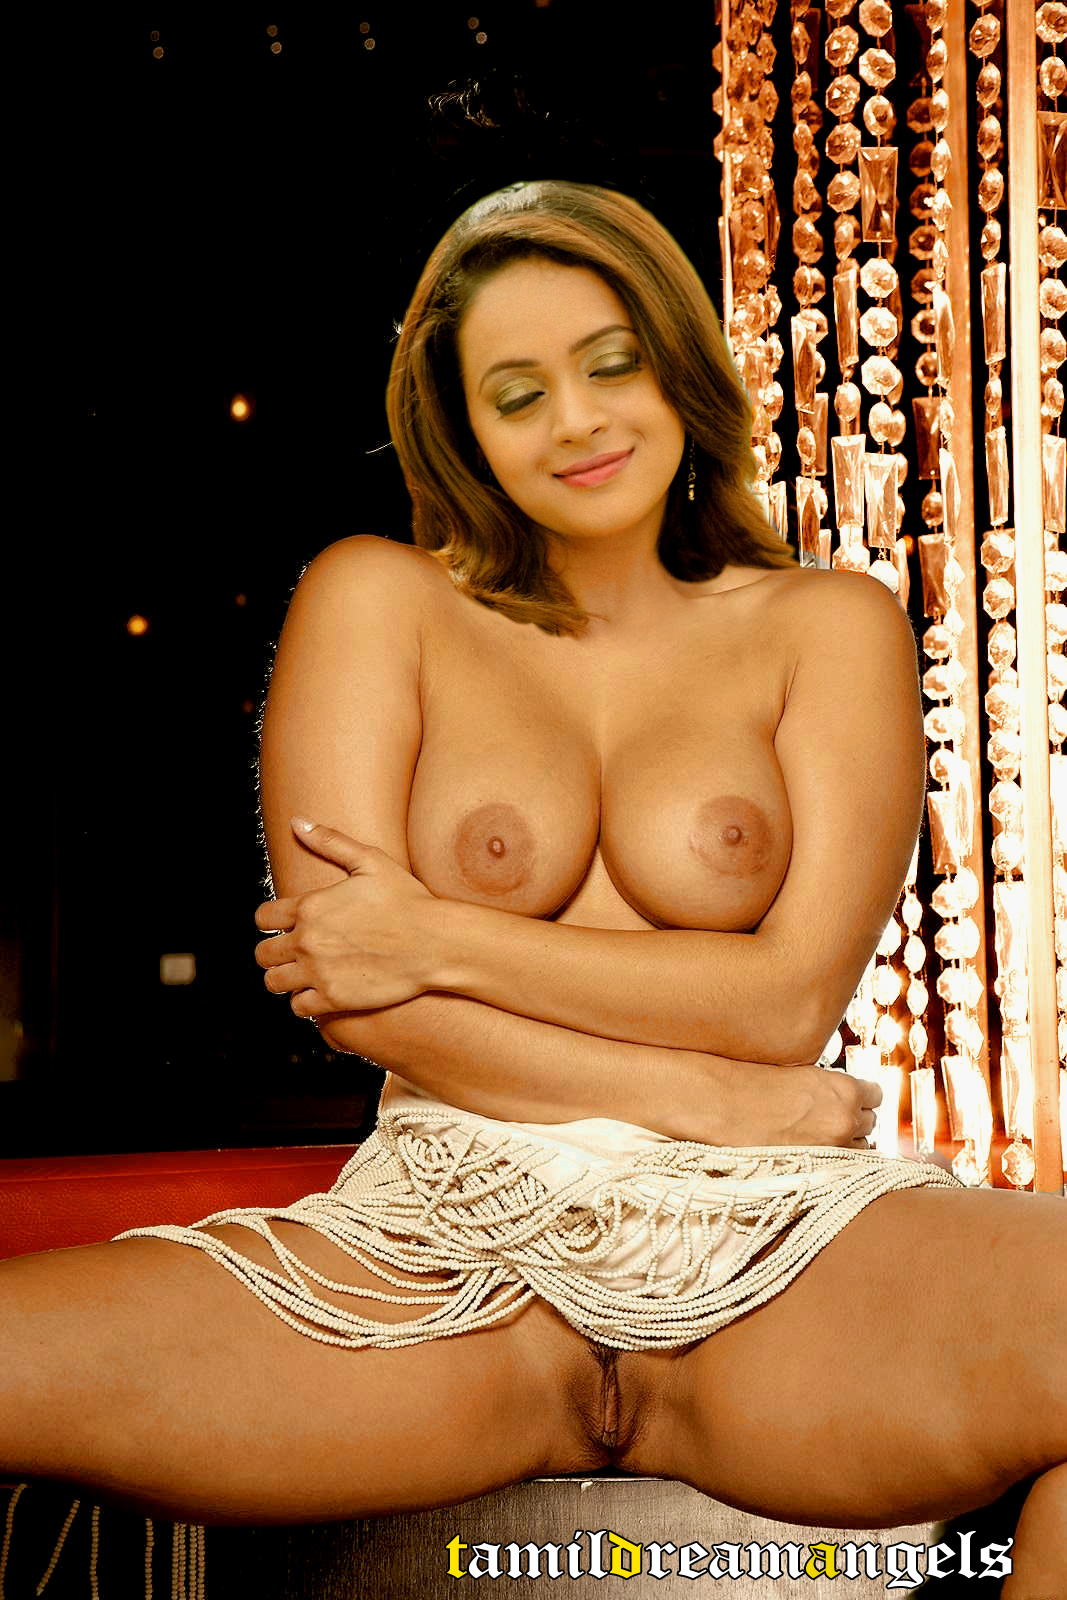 Beautiful ass sexy round nude